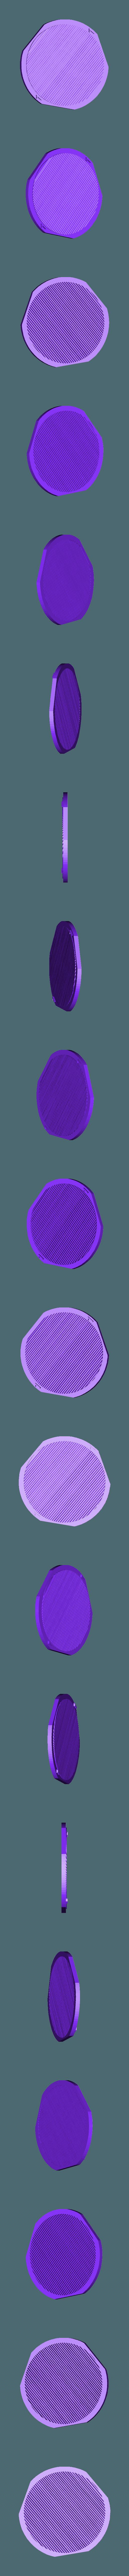 Rejilla_1.stl Download free STL file #3DvsCOVID19 Mask filters with side breathing • 3D printer object, alonsothander